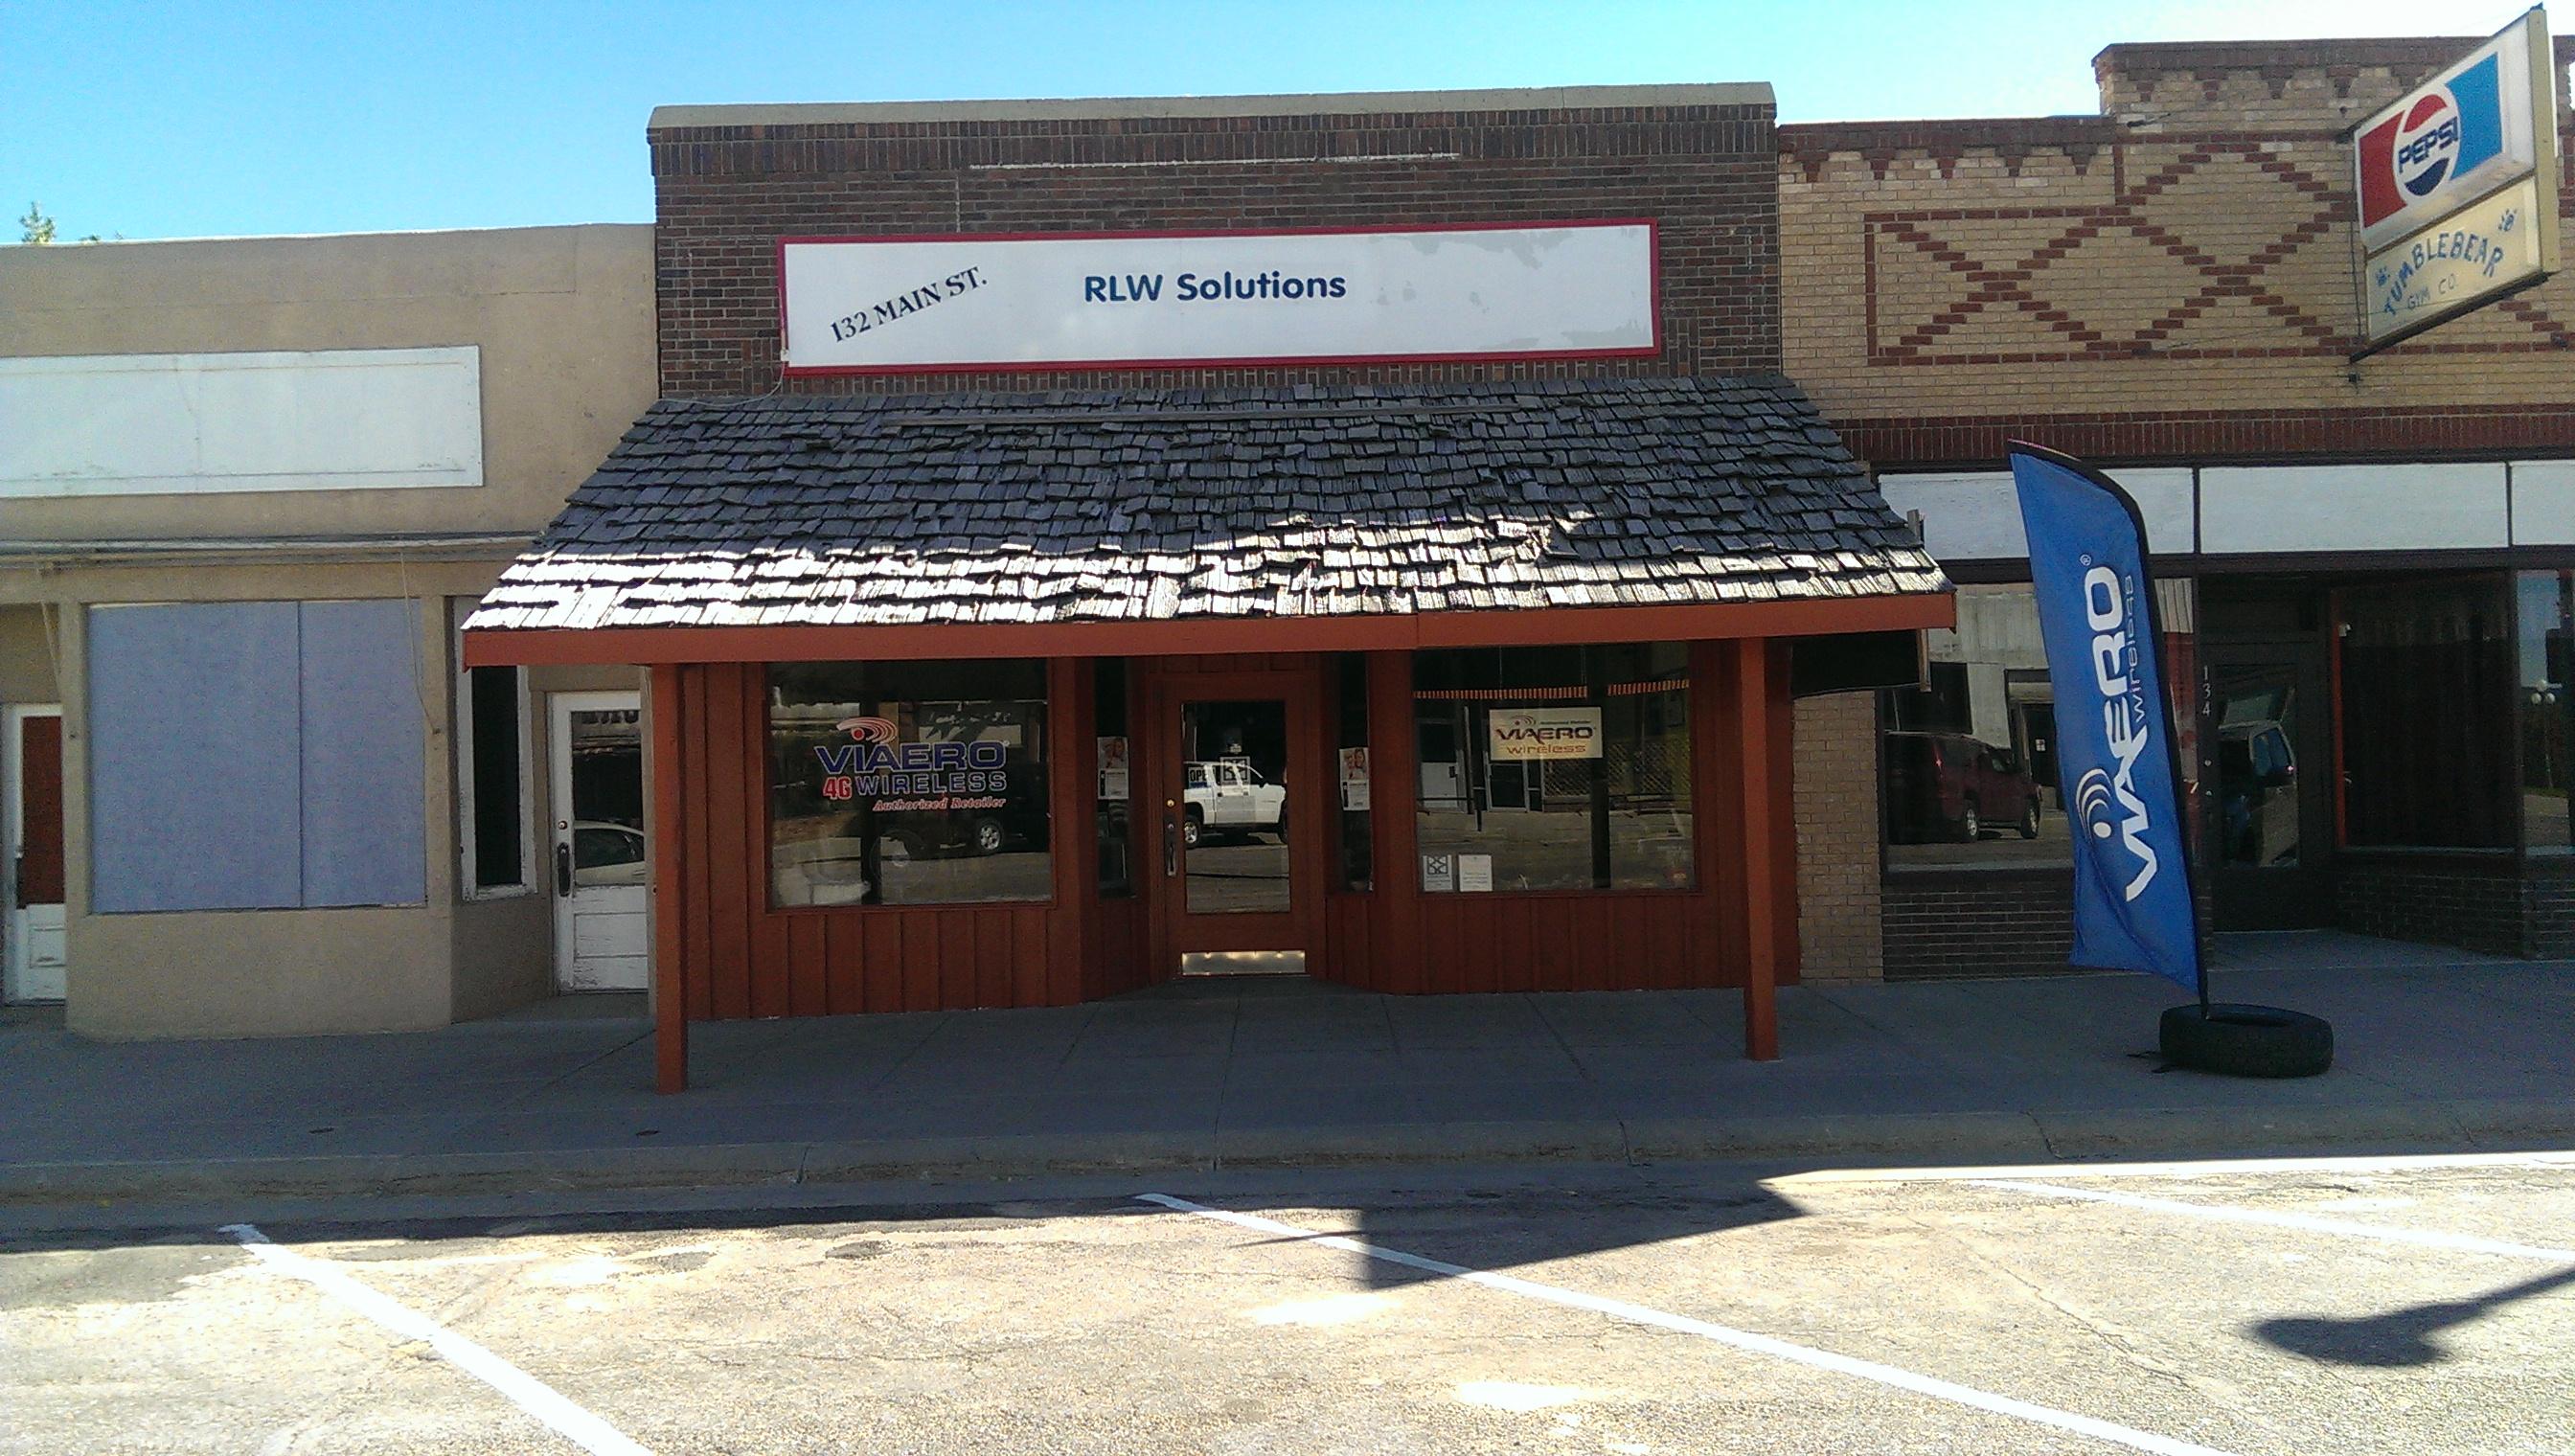 RLW Solutions in Rushville, NE 69360 - ChamberofCommerce.com